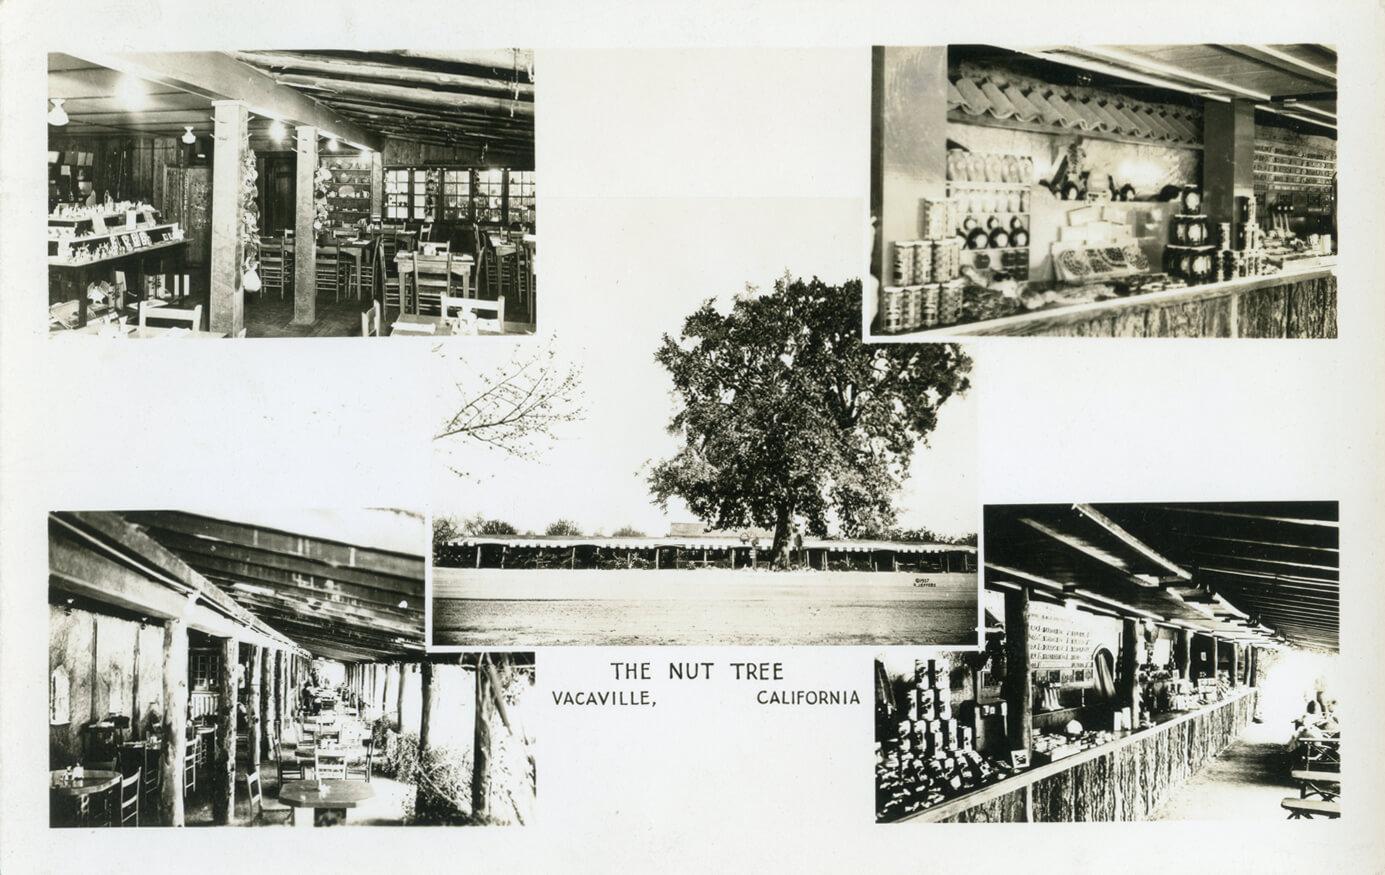 Nut Tree Restaurant vacaville